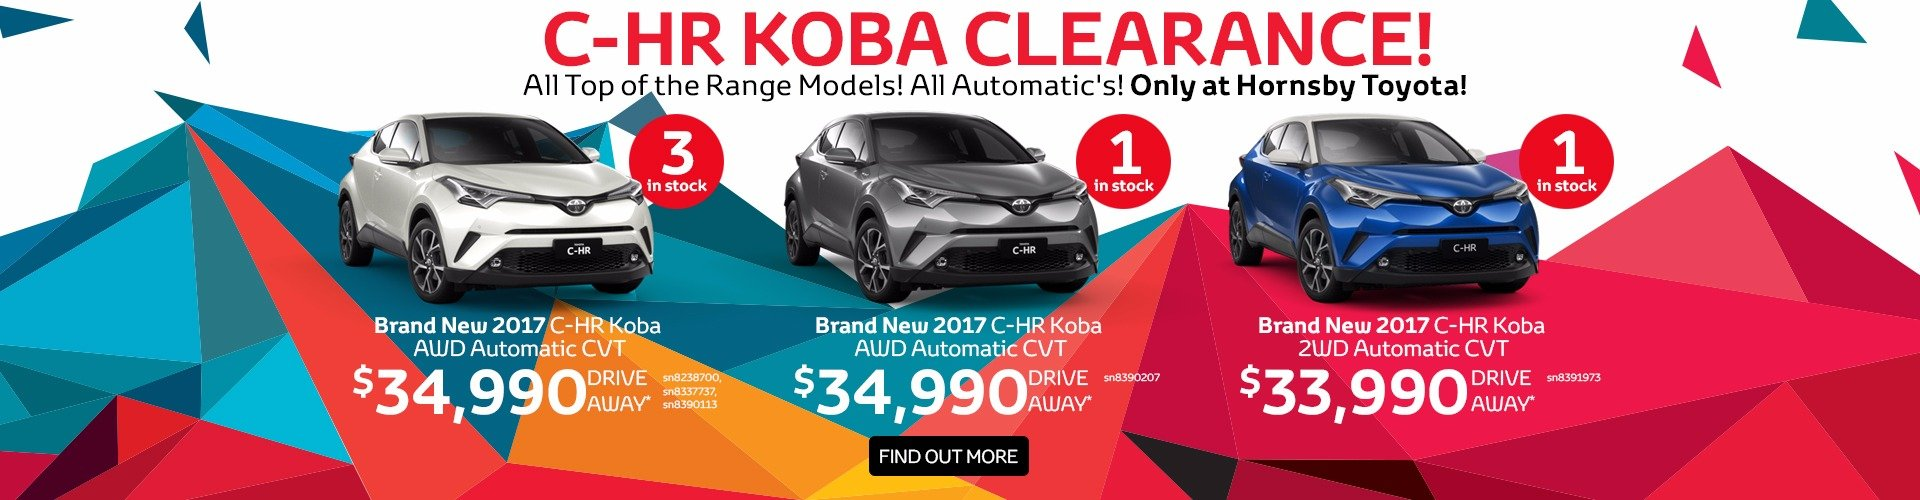 C-HR Koba clearance